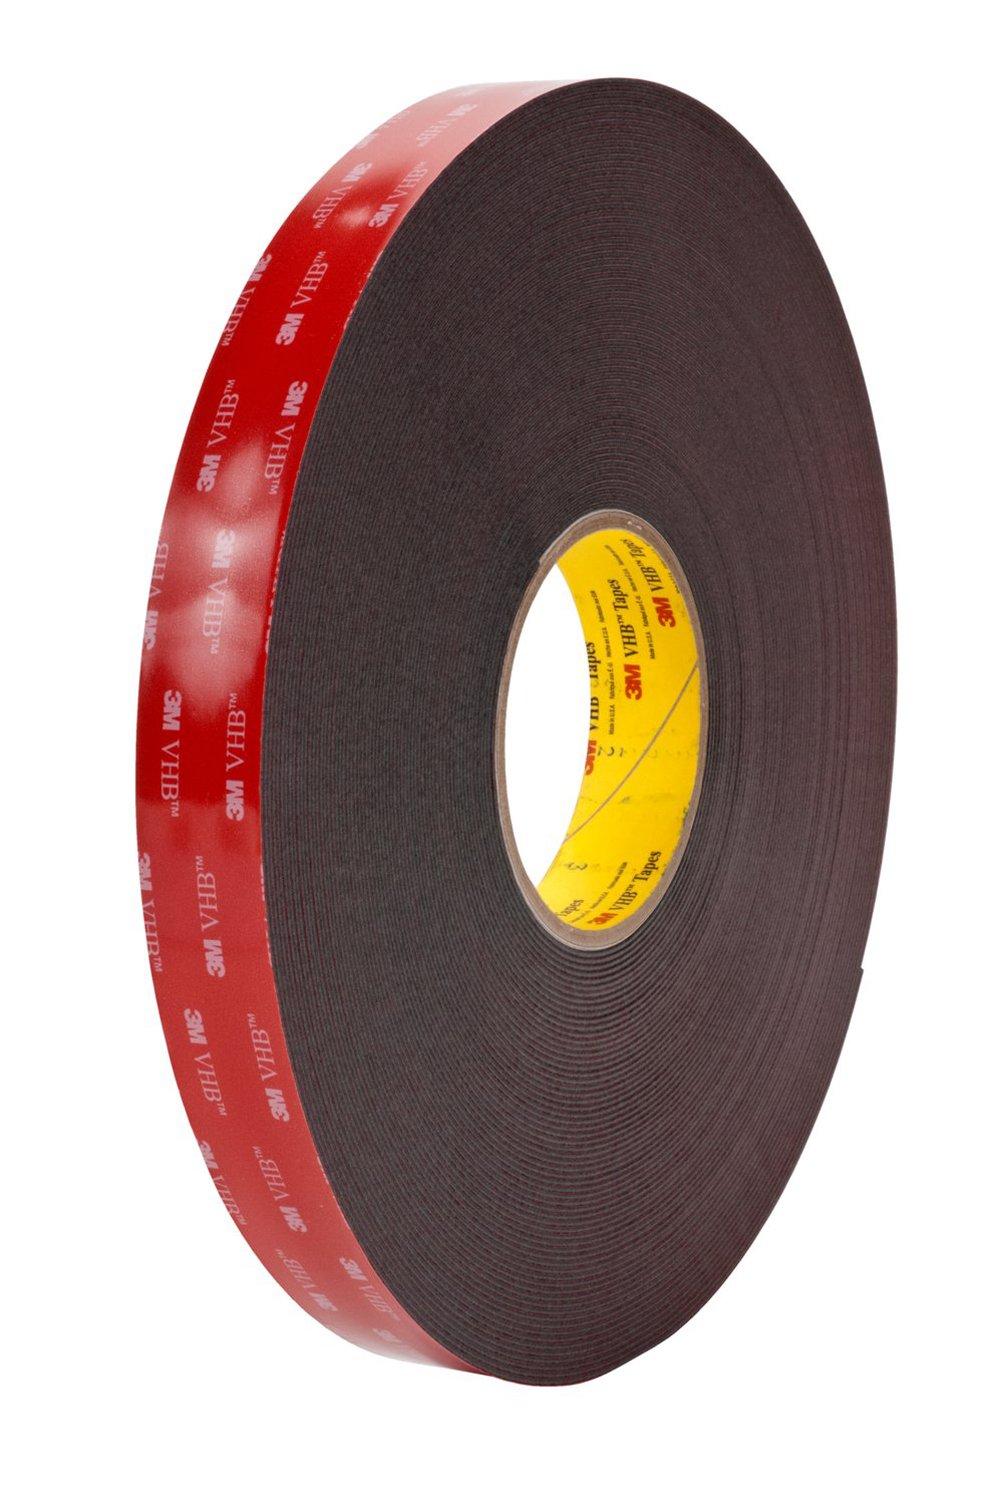 3M VHB Heavy Duty Mounting Tape 5952, 0.5'' width x 5yd length (1 Roll)